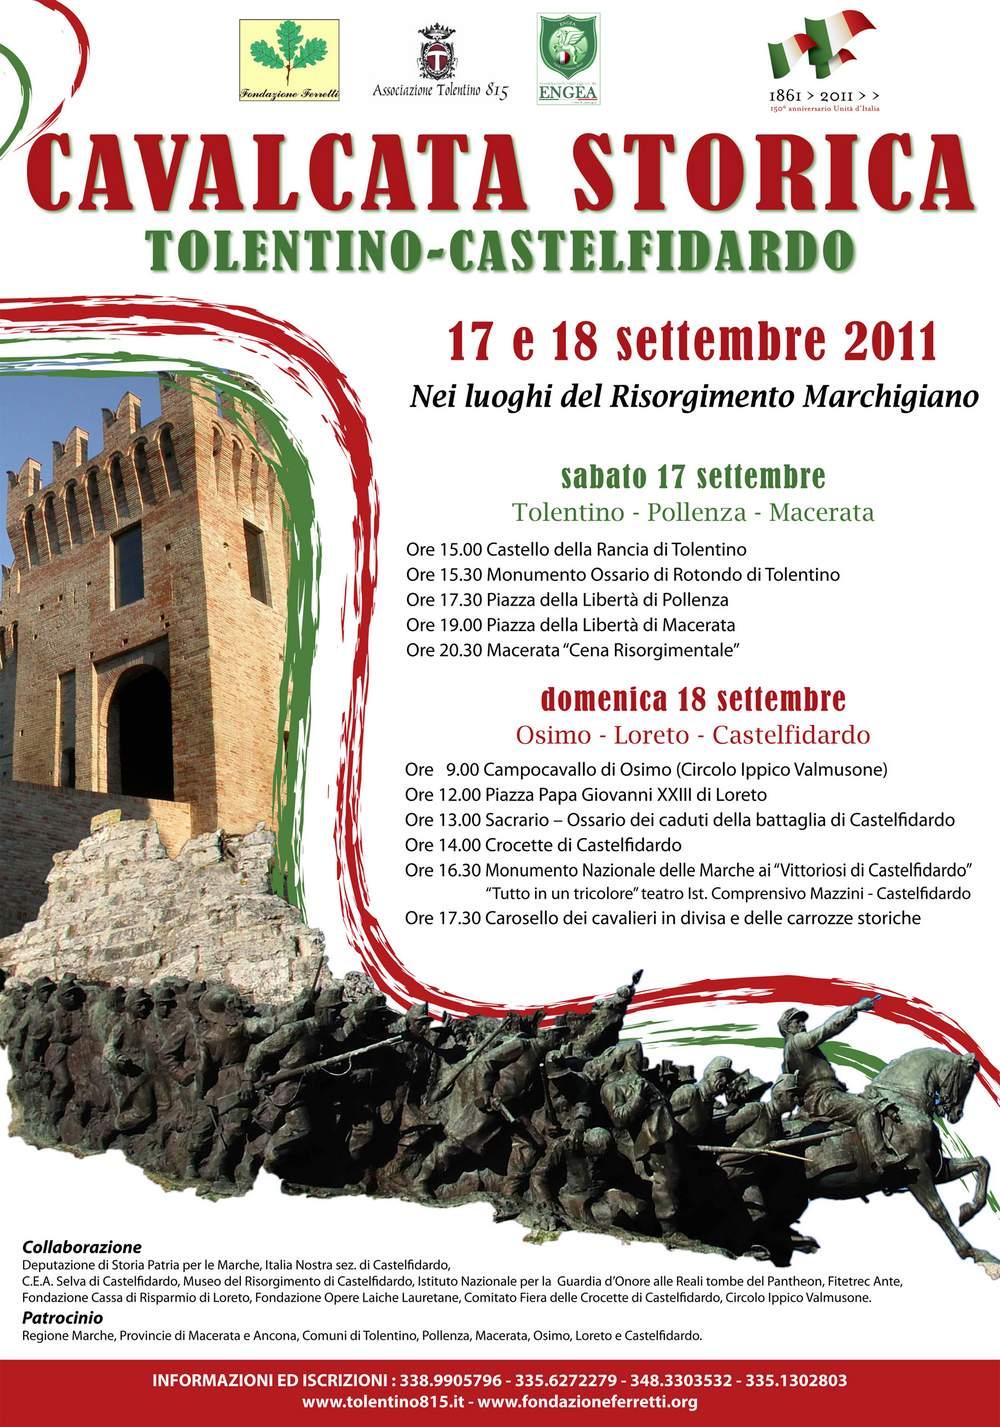 Cavalcata storica Tolentino - Castelfidardo